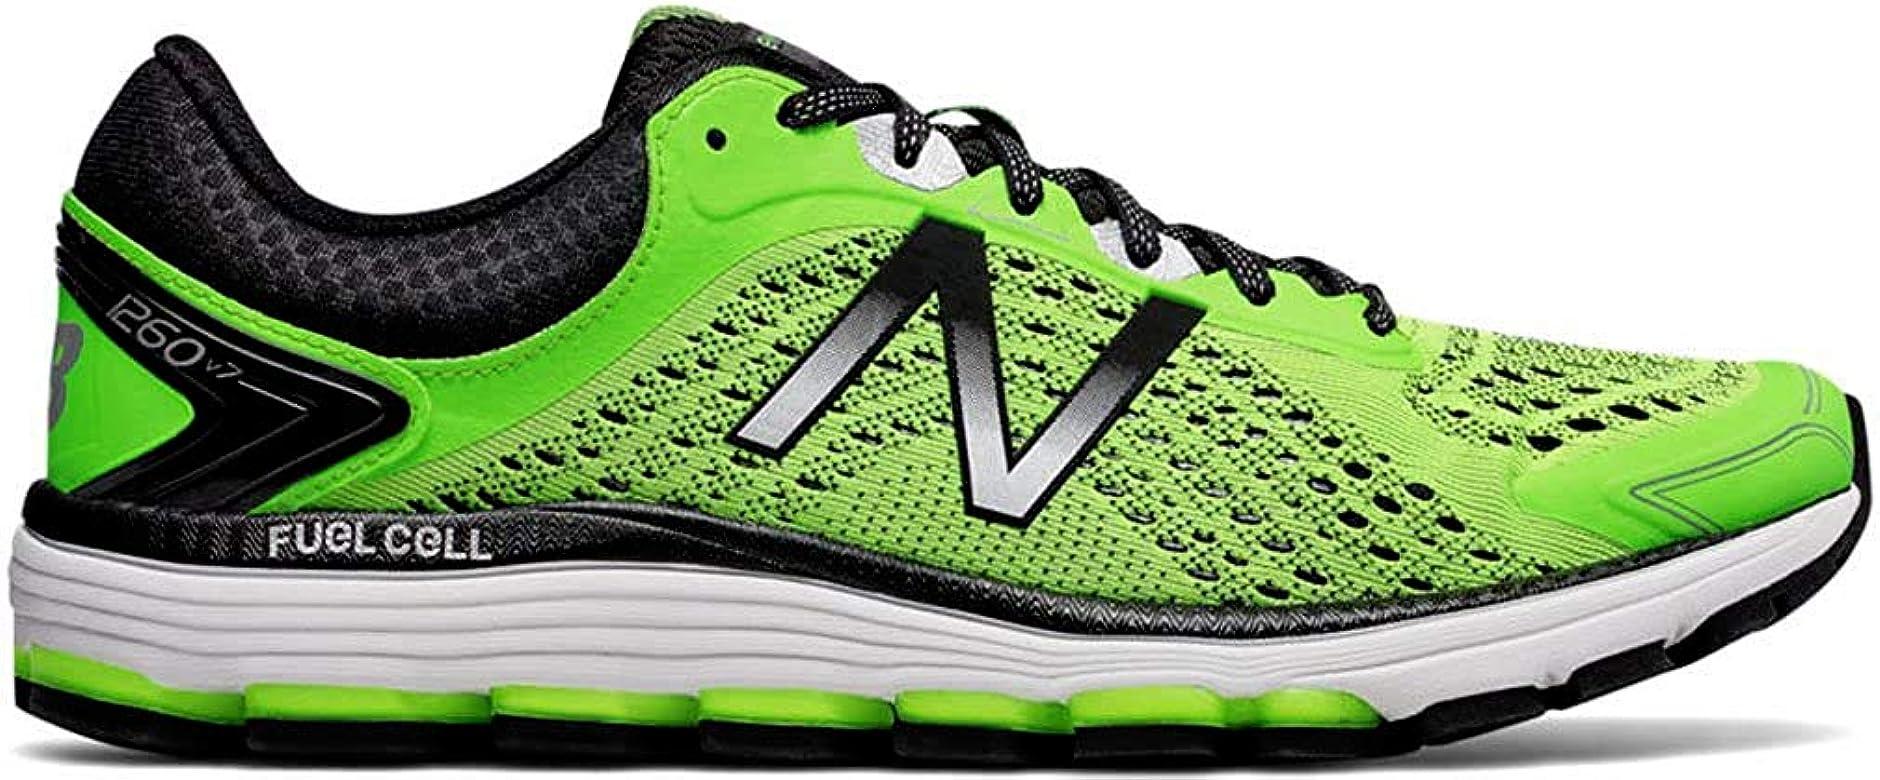 New Balance M1260v7 Zapatillas para Correr (2E Width) - AW17-43: Amazon.es: Zapatos y complementos